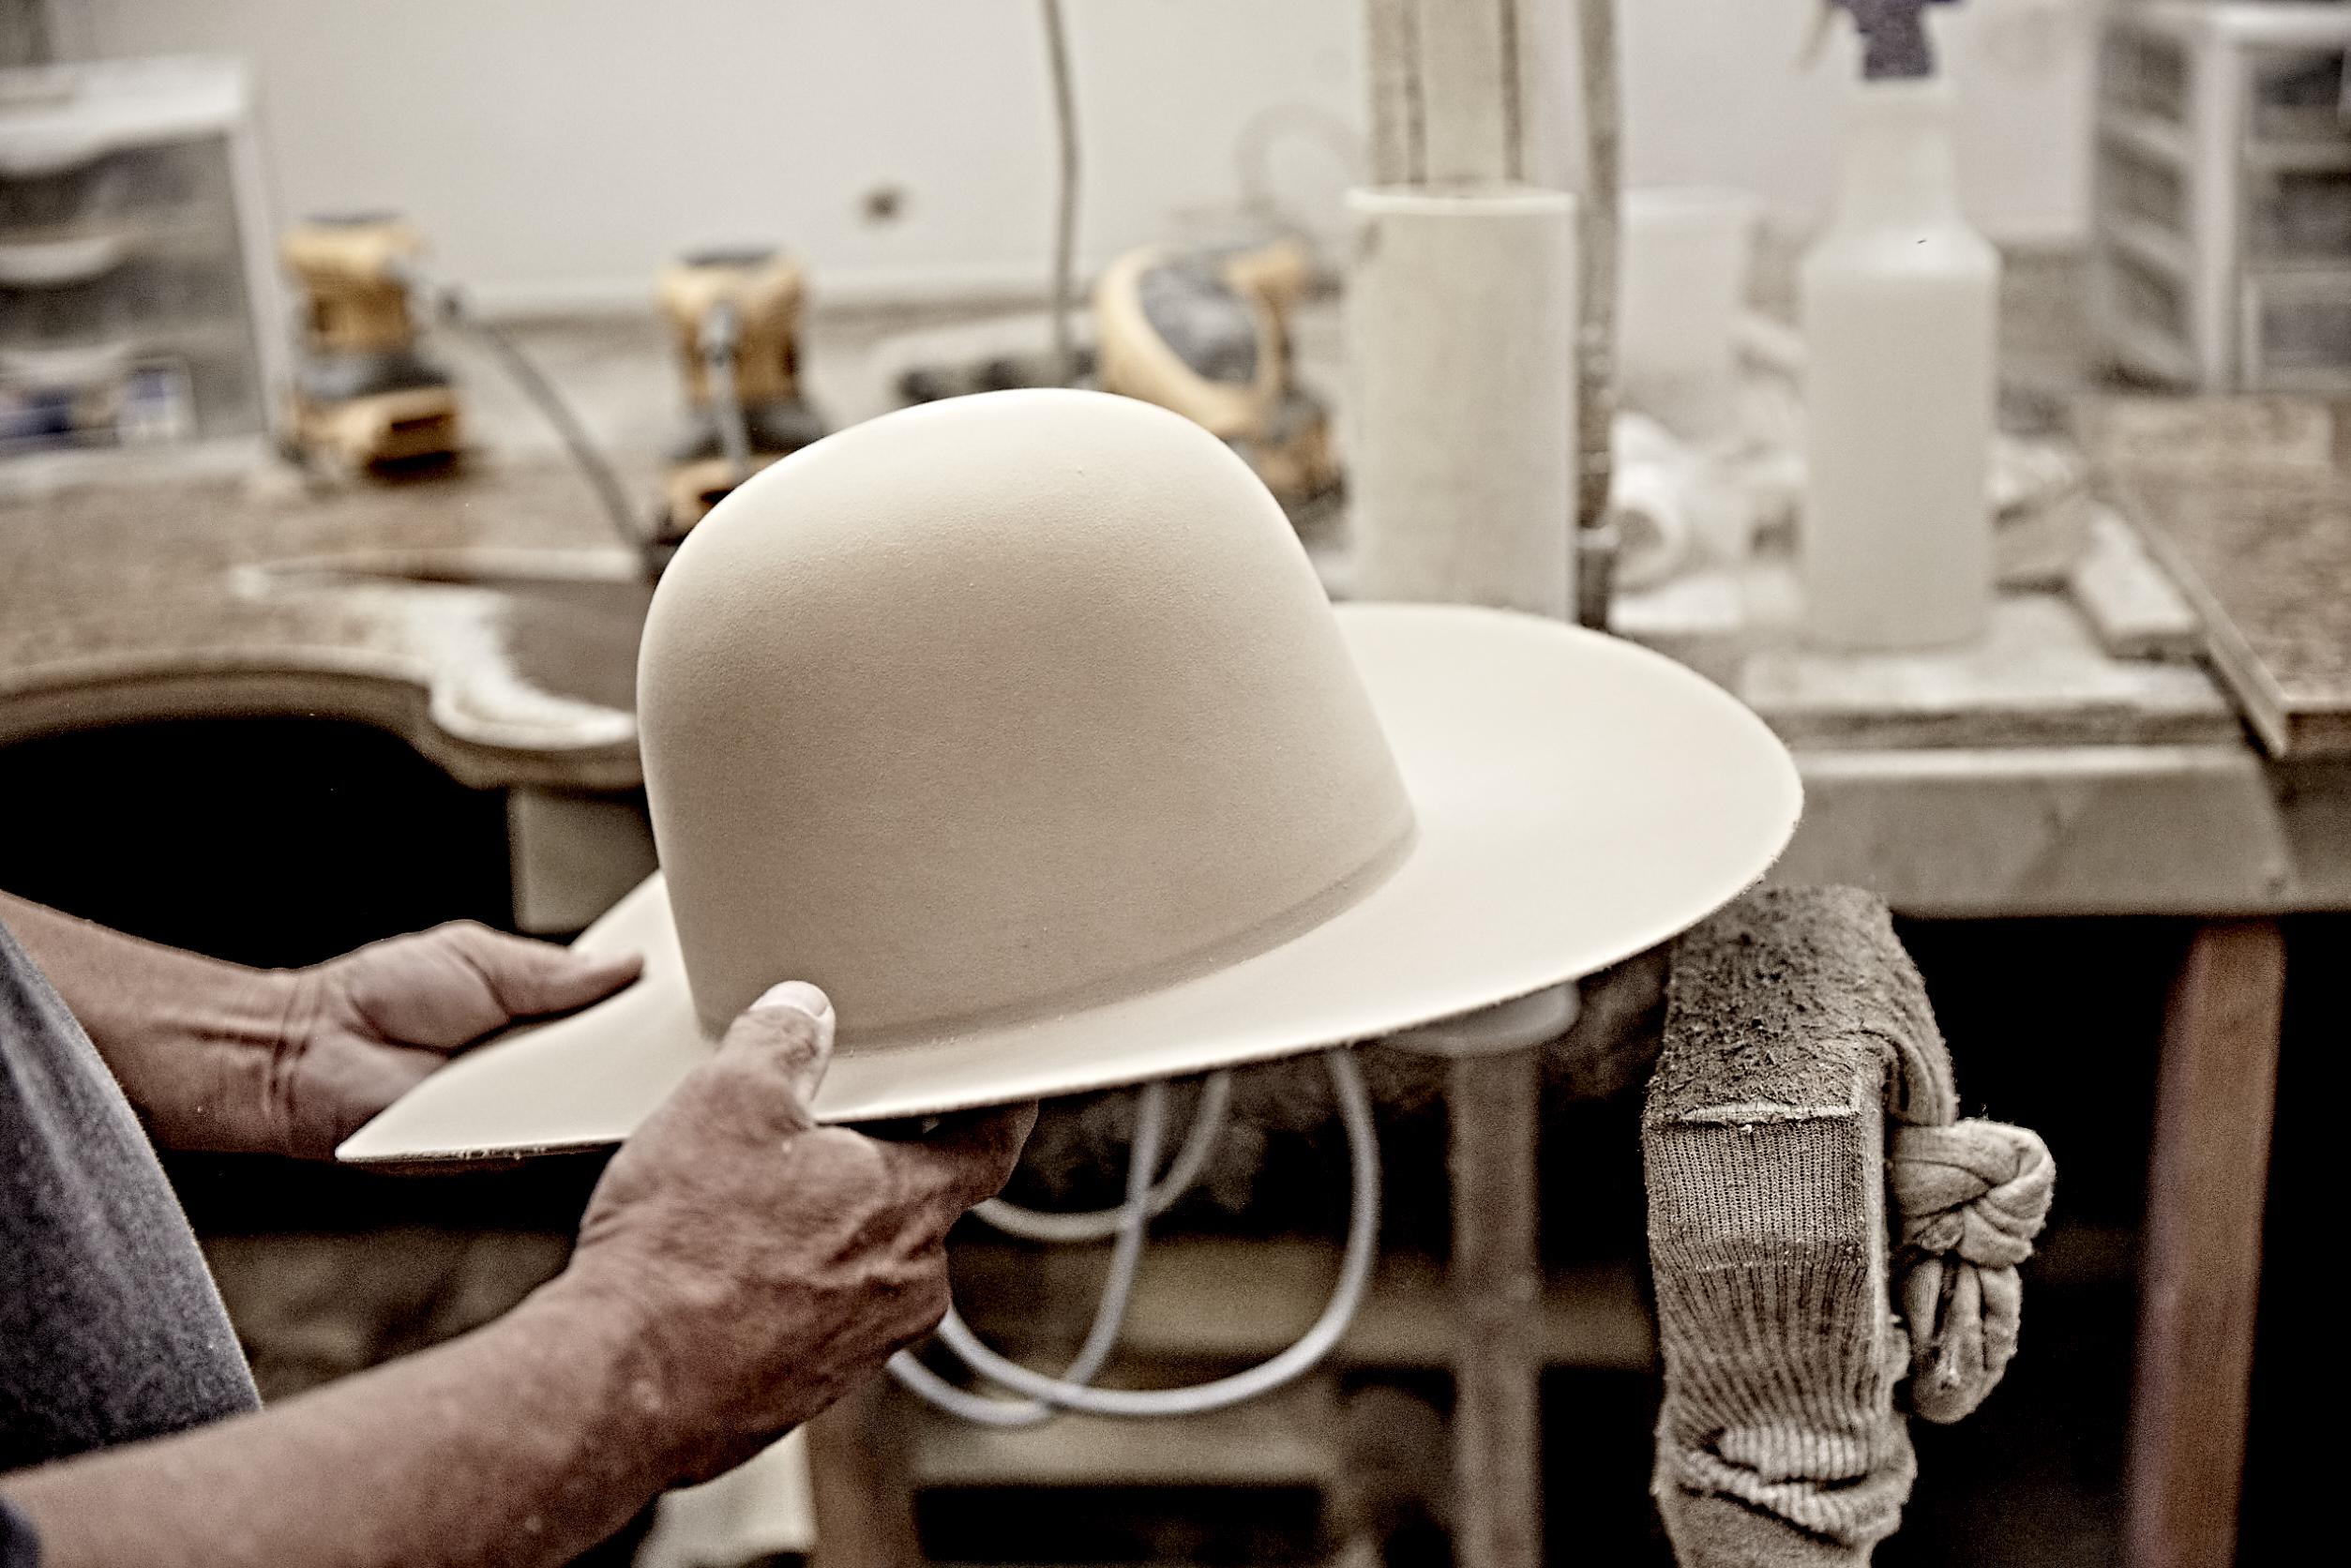 american hat company american hat co felt felts felt hat felt hats cowboy cowboys cowboy hat cowboy hats refurbish reblock 40x